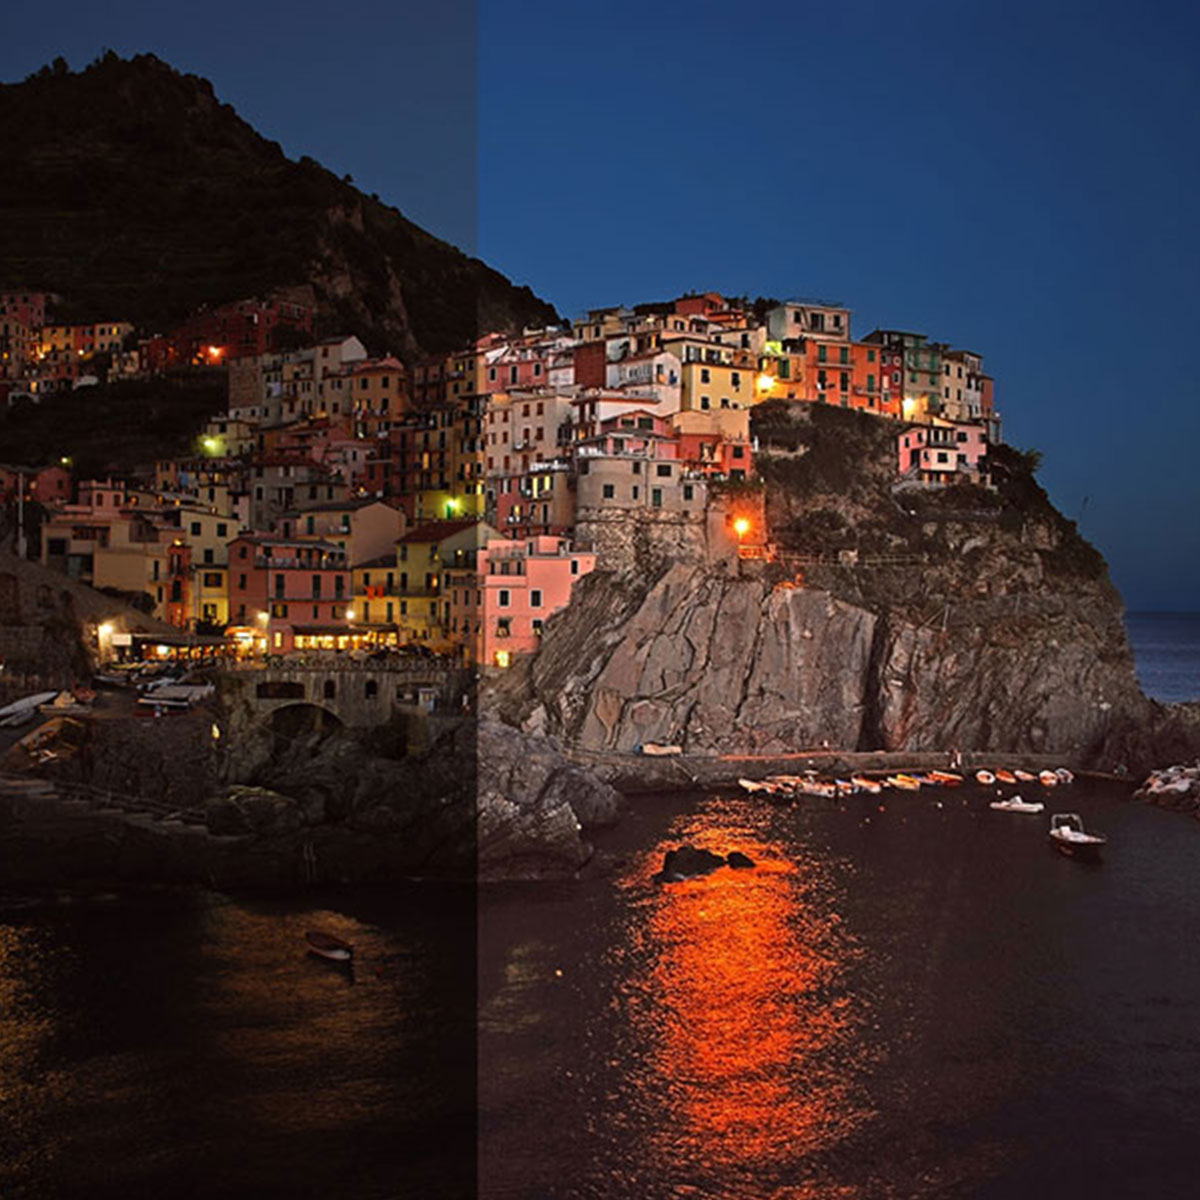 night-photoos-retouching